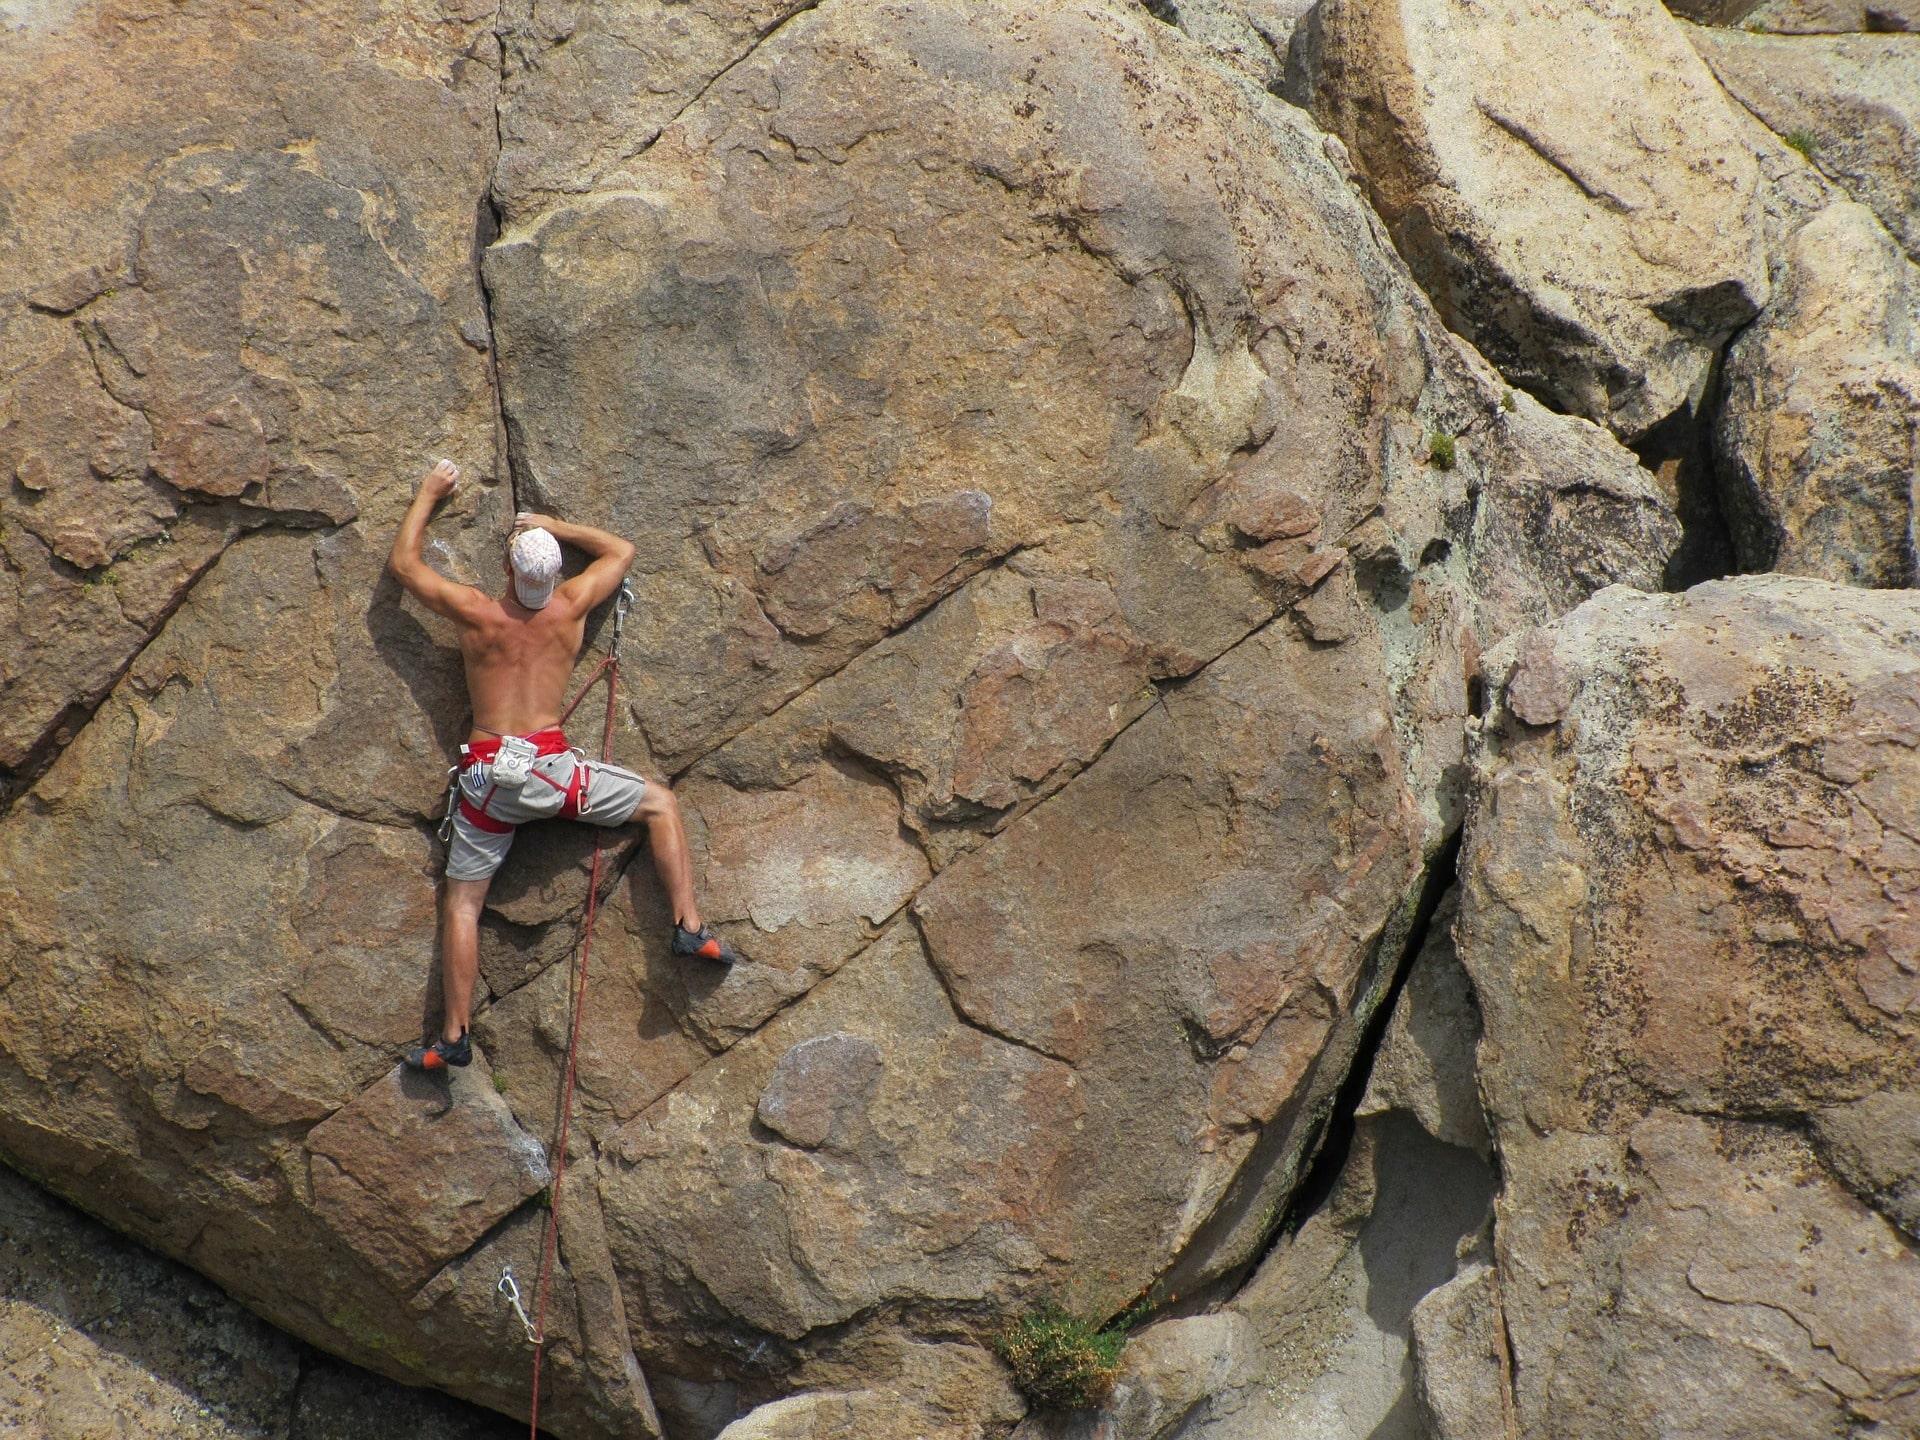 Rock climbing initiation course in Cerdanya